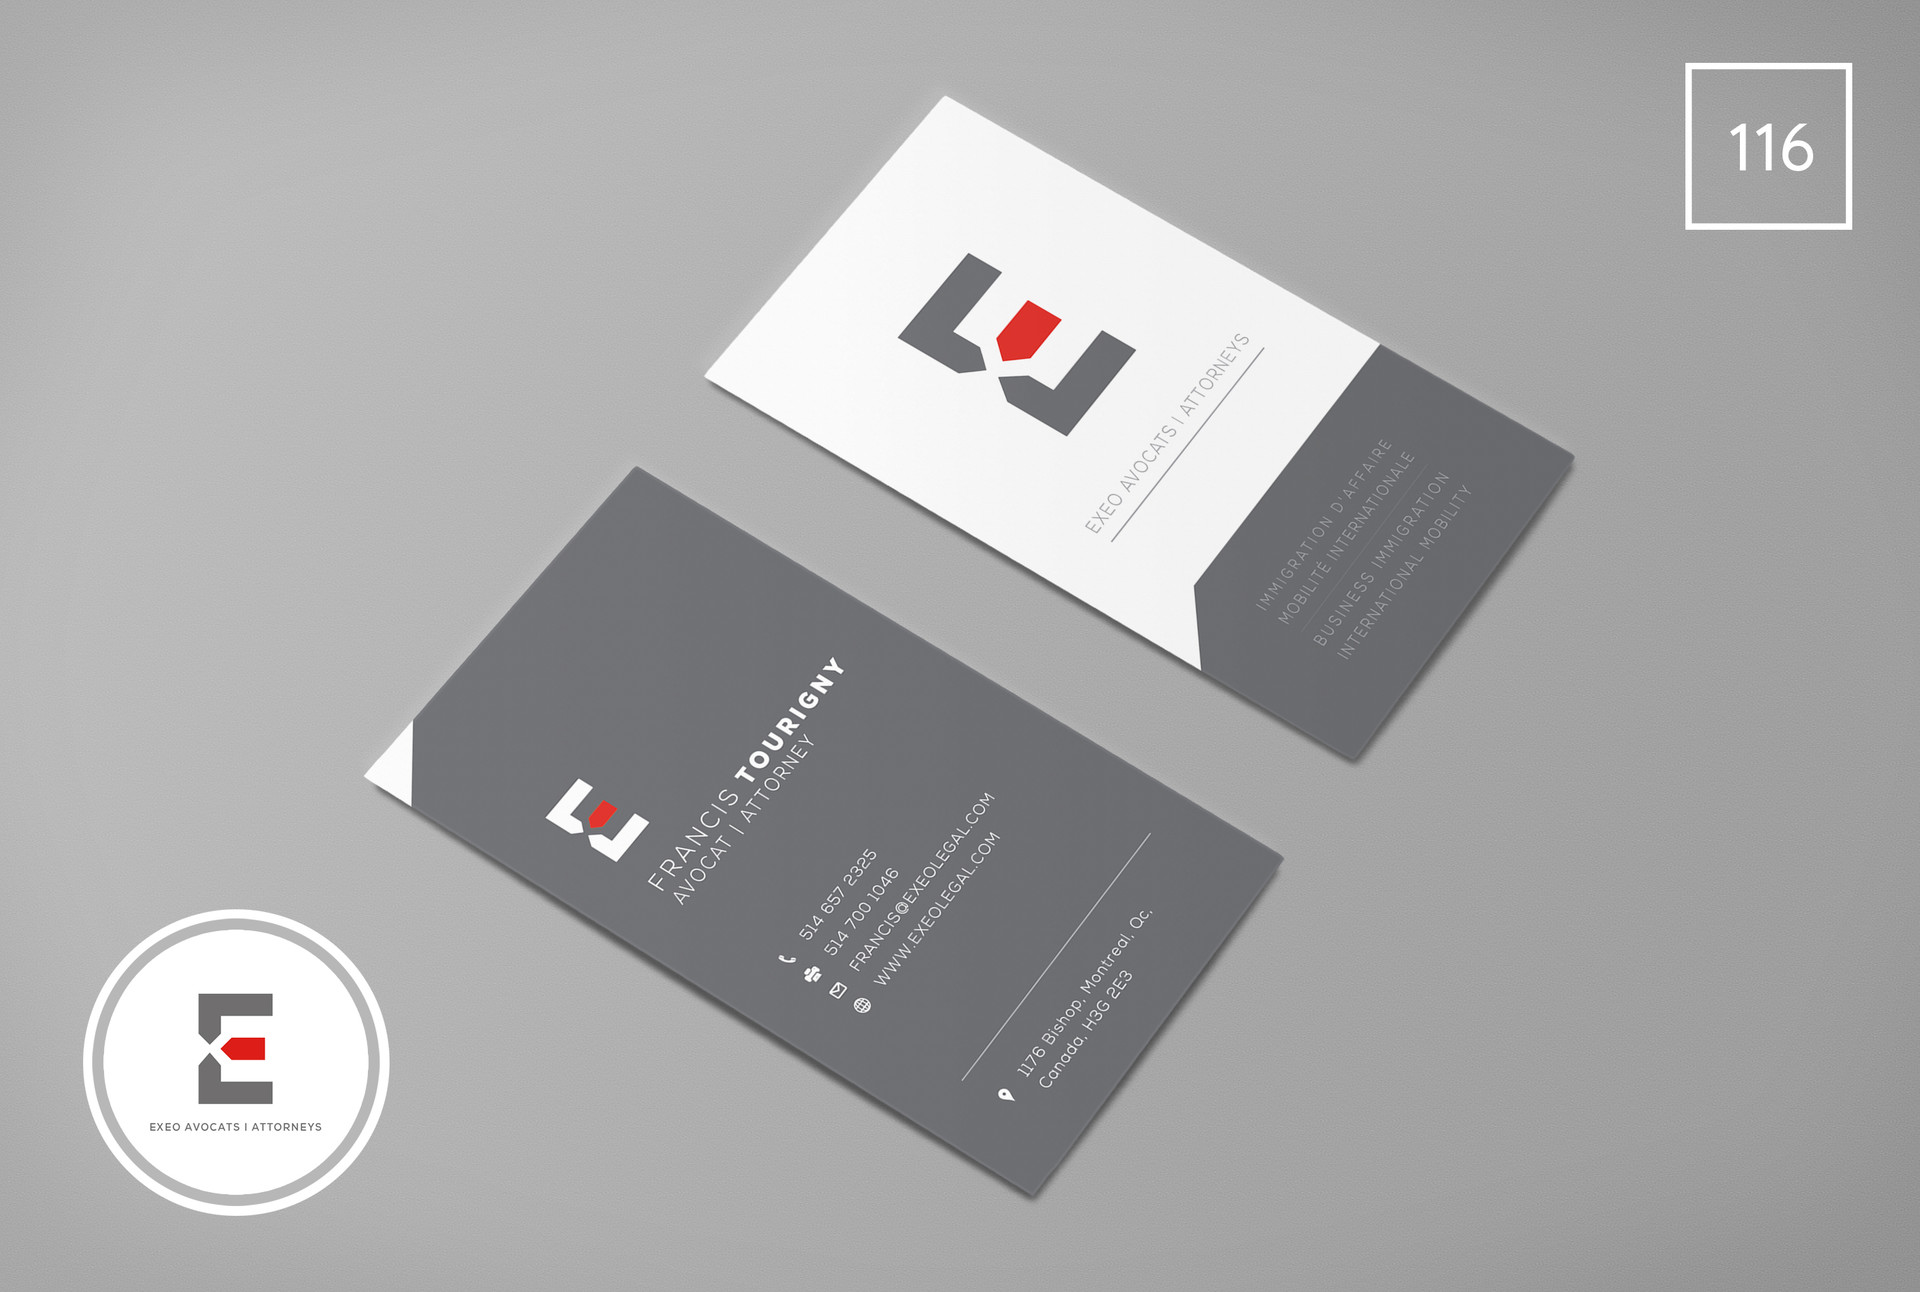 CM DESIGNS - BUSINESS CARDS